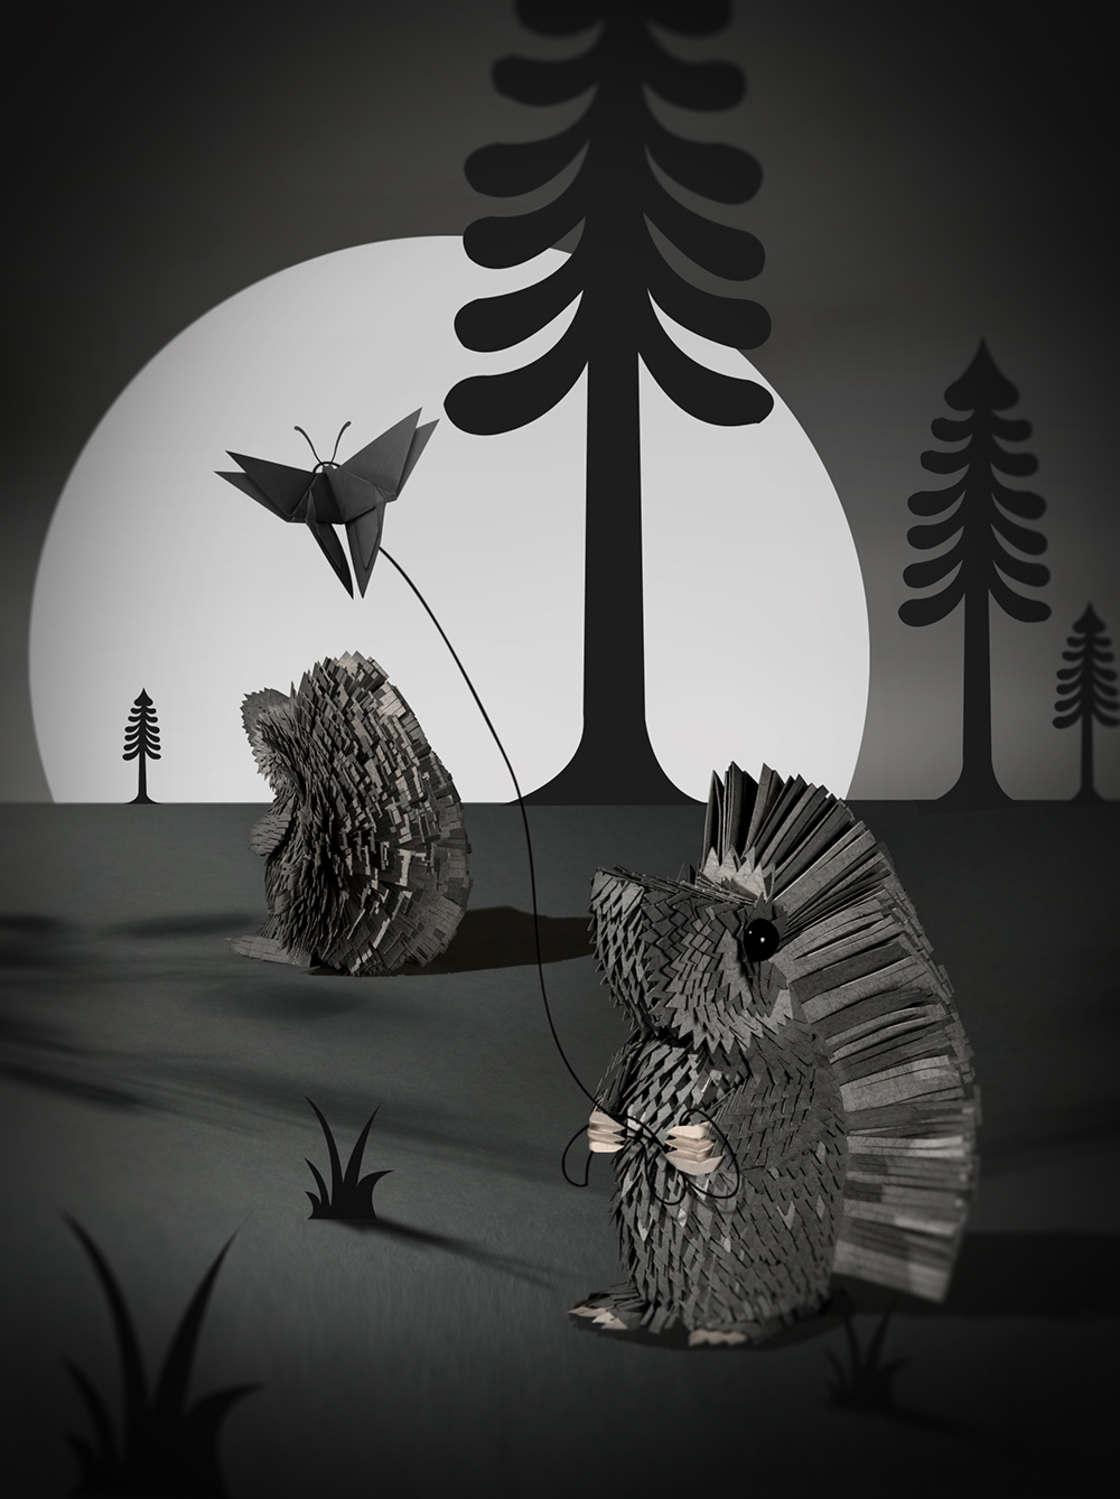 The papercut illustrations by Lisa Lloyd